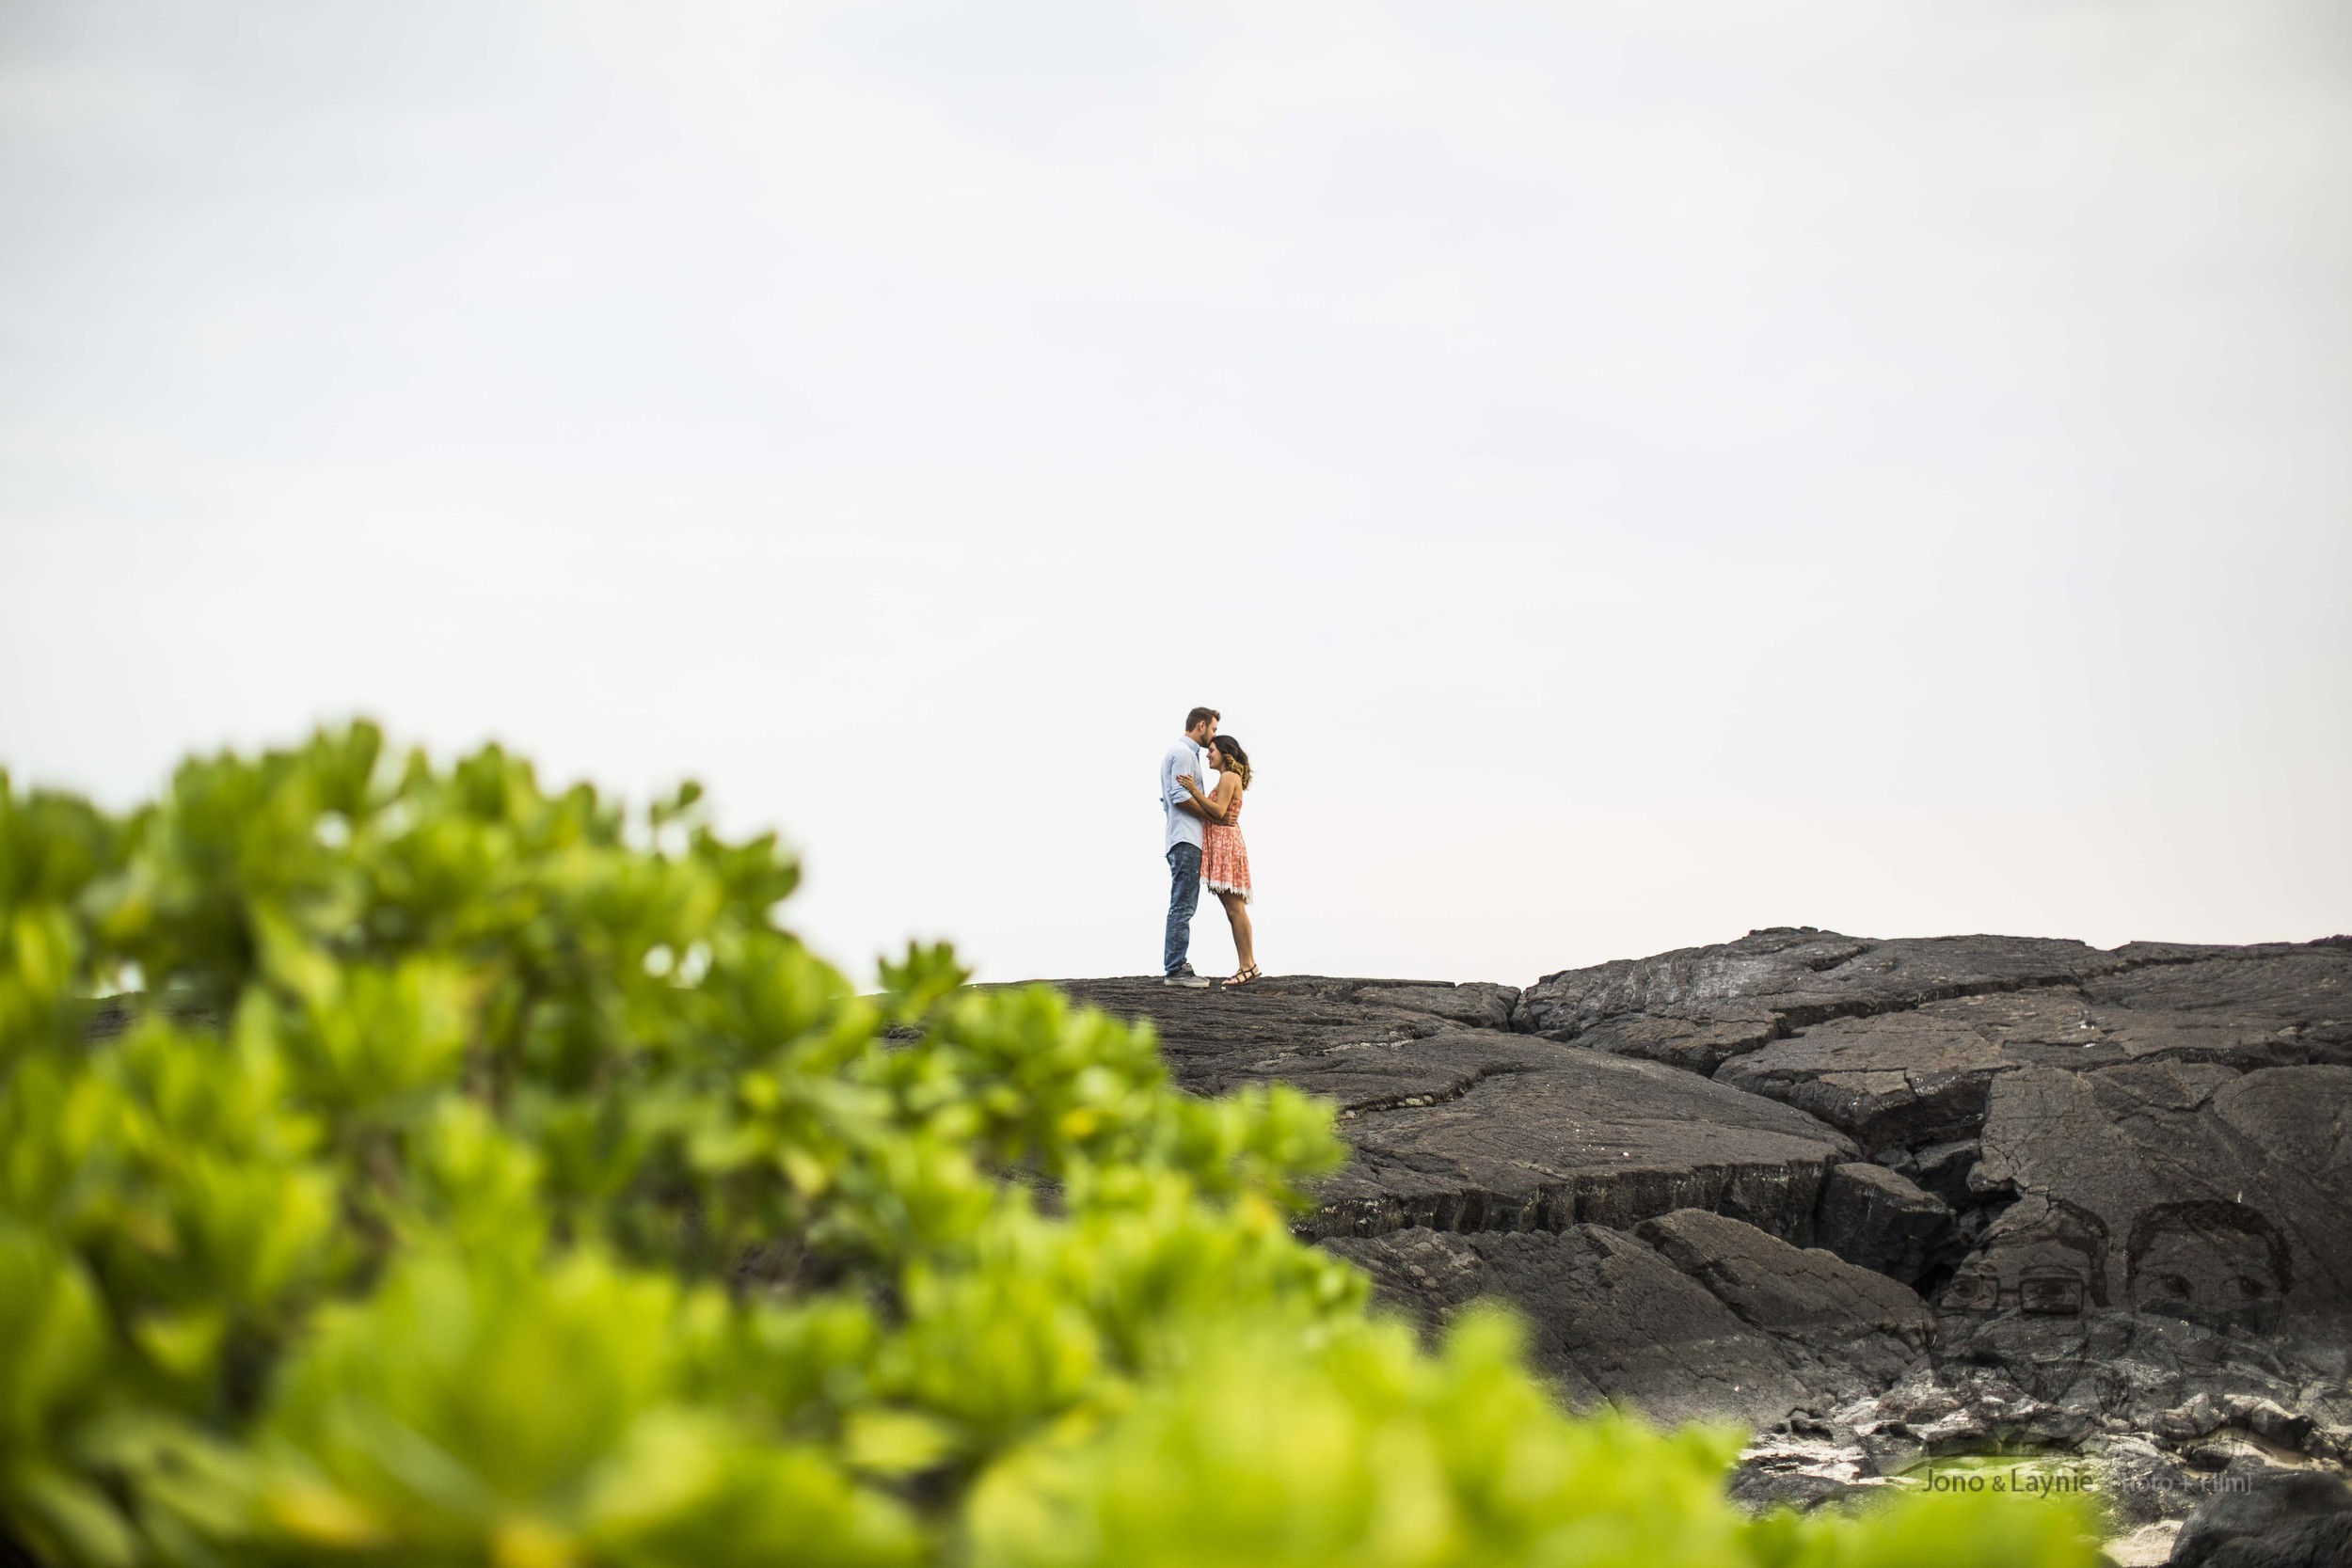 Jono & Laynie Co.-Kona, Hawaii-Engagement Session15.jpg